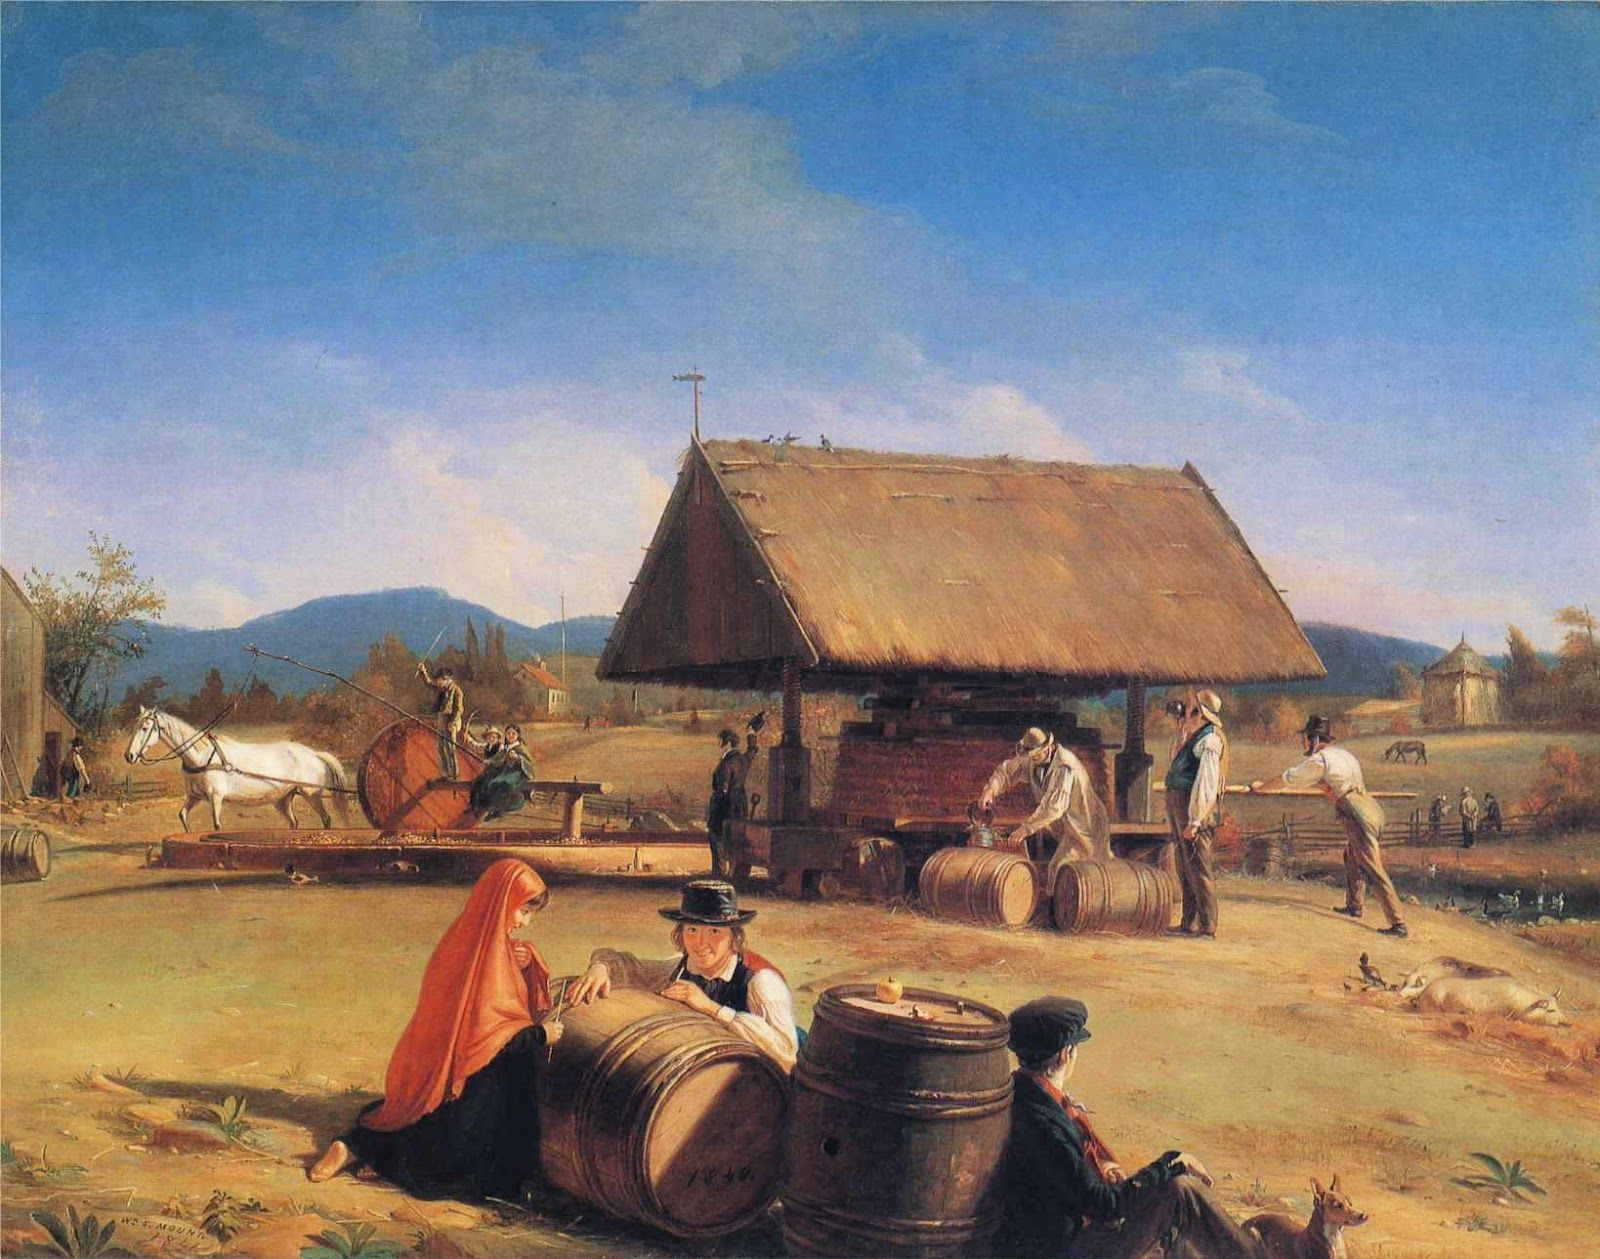 William Sidney Mount | William Sidney Mount | Pinterest